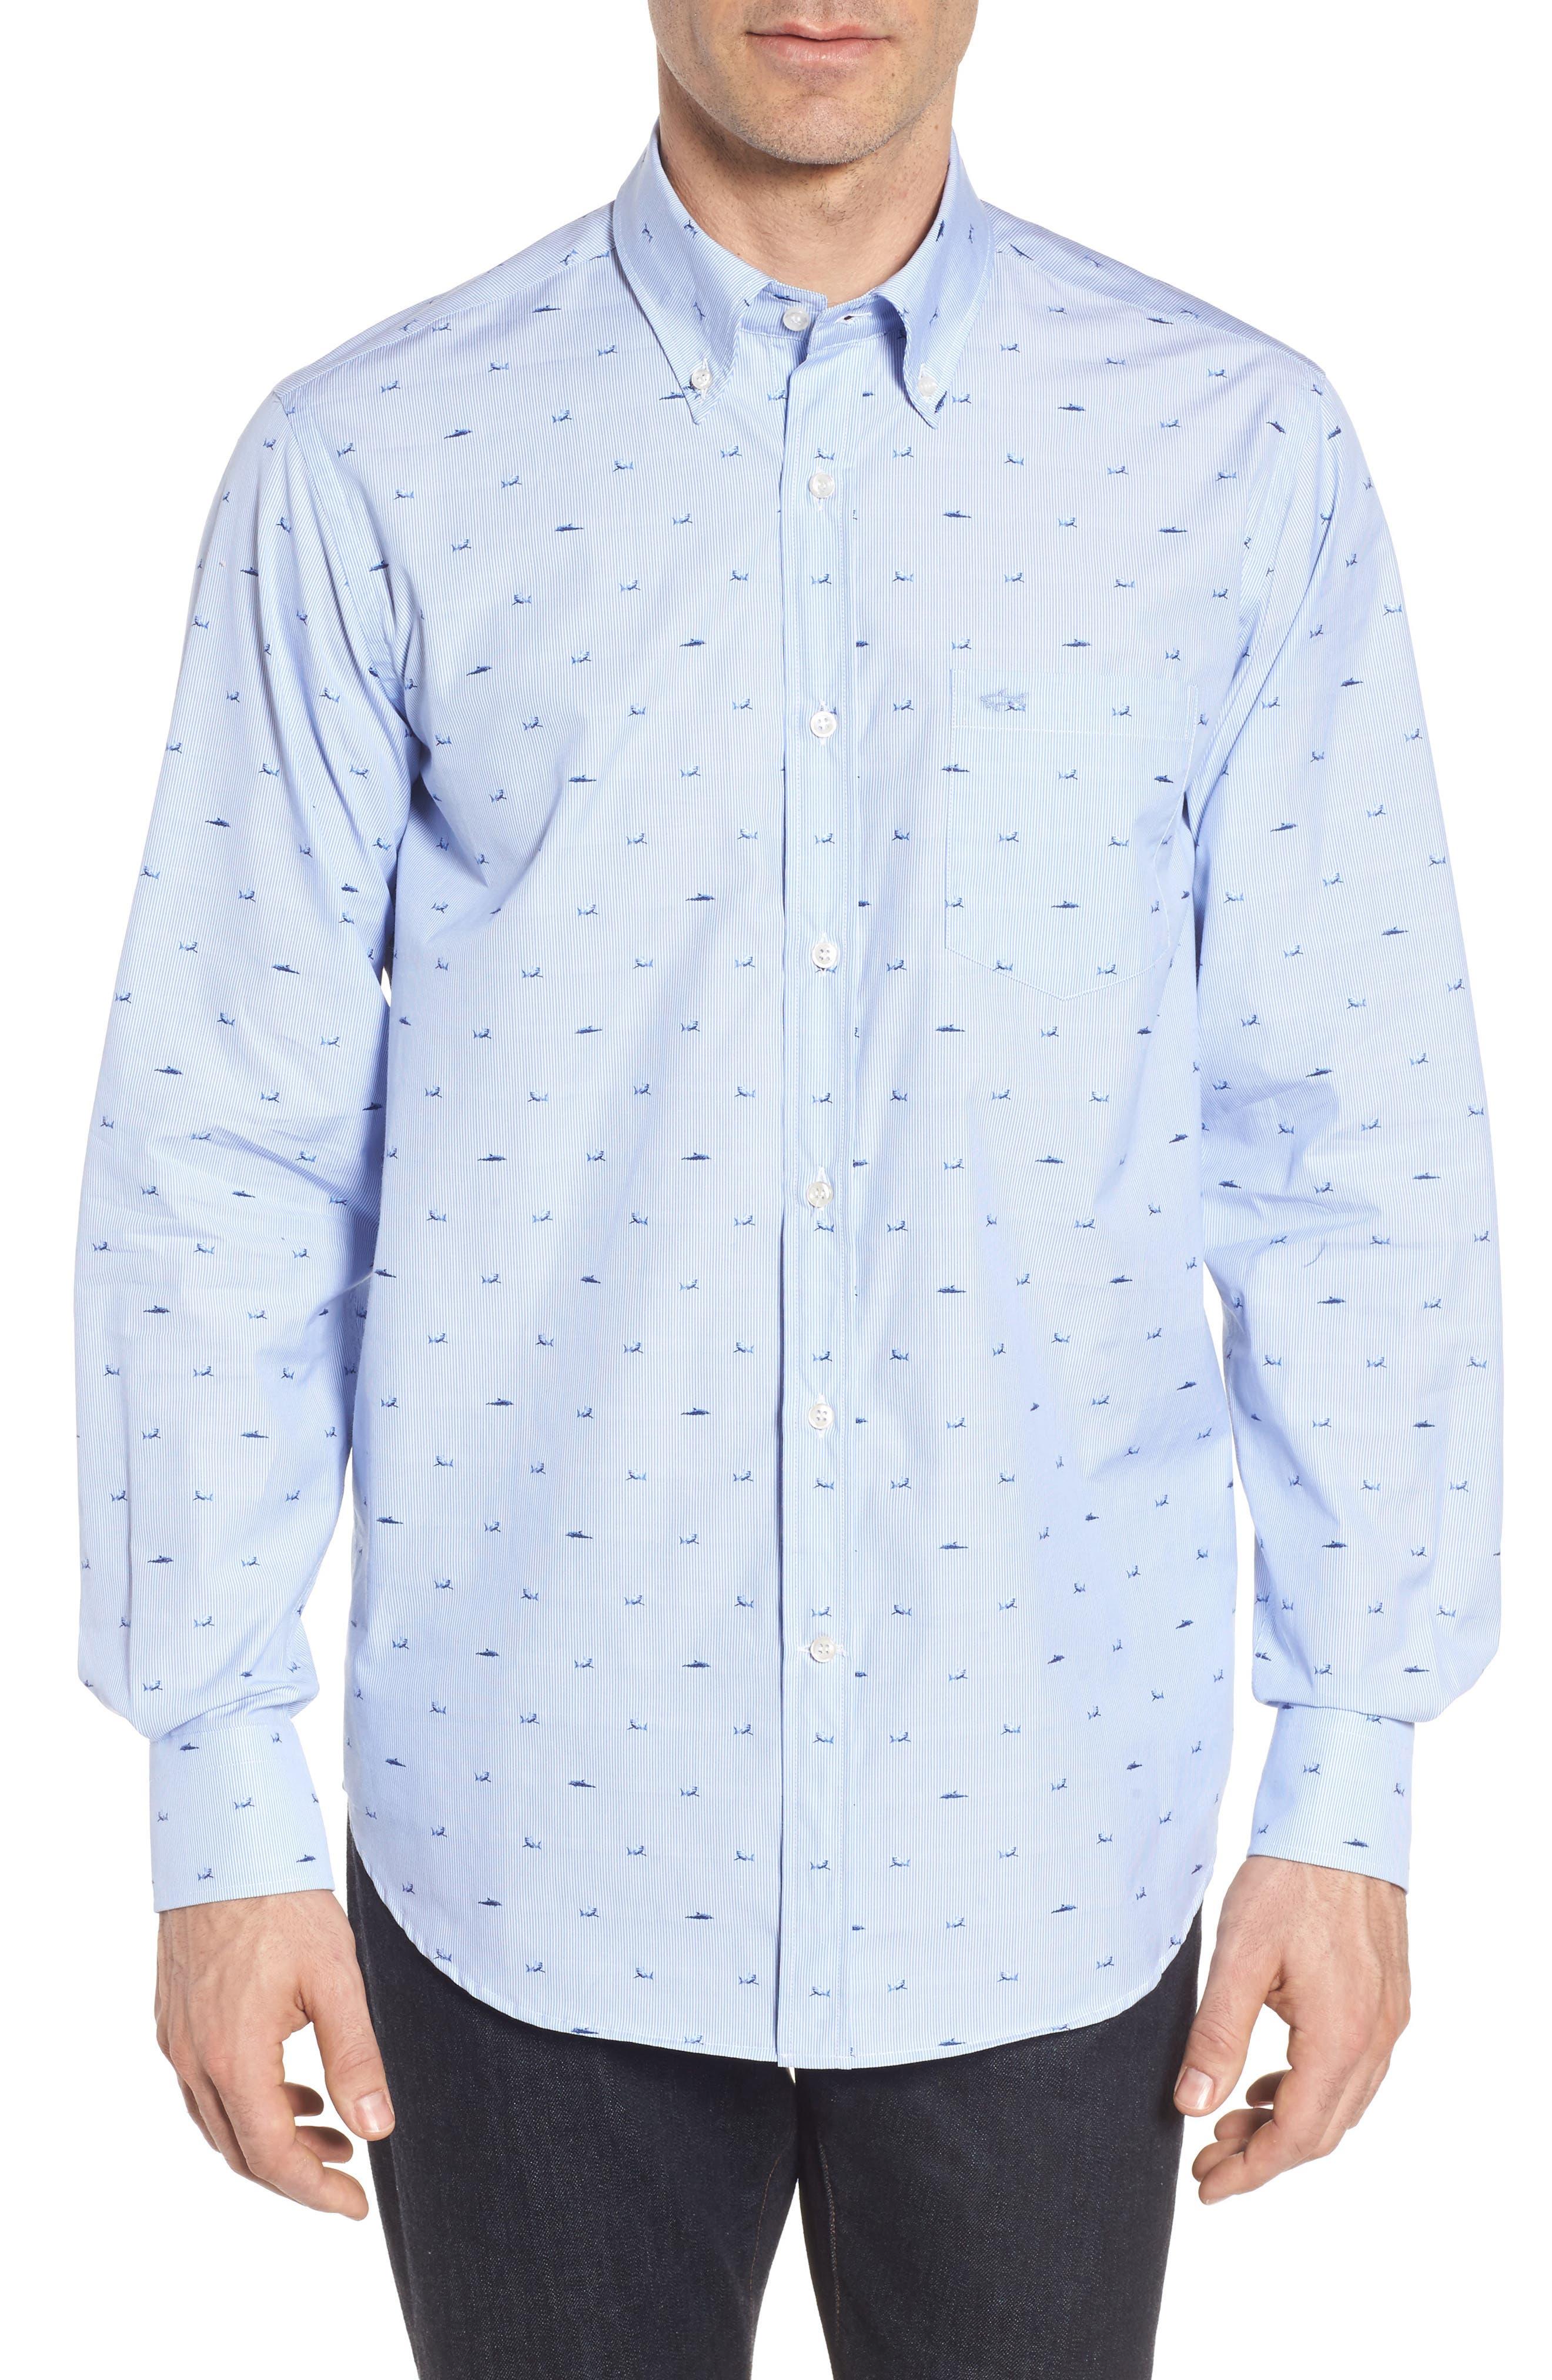 Paul&Shark Great White Jacquard Sport Shirt,                         Main,                         color,